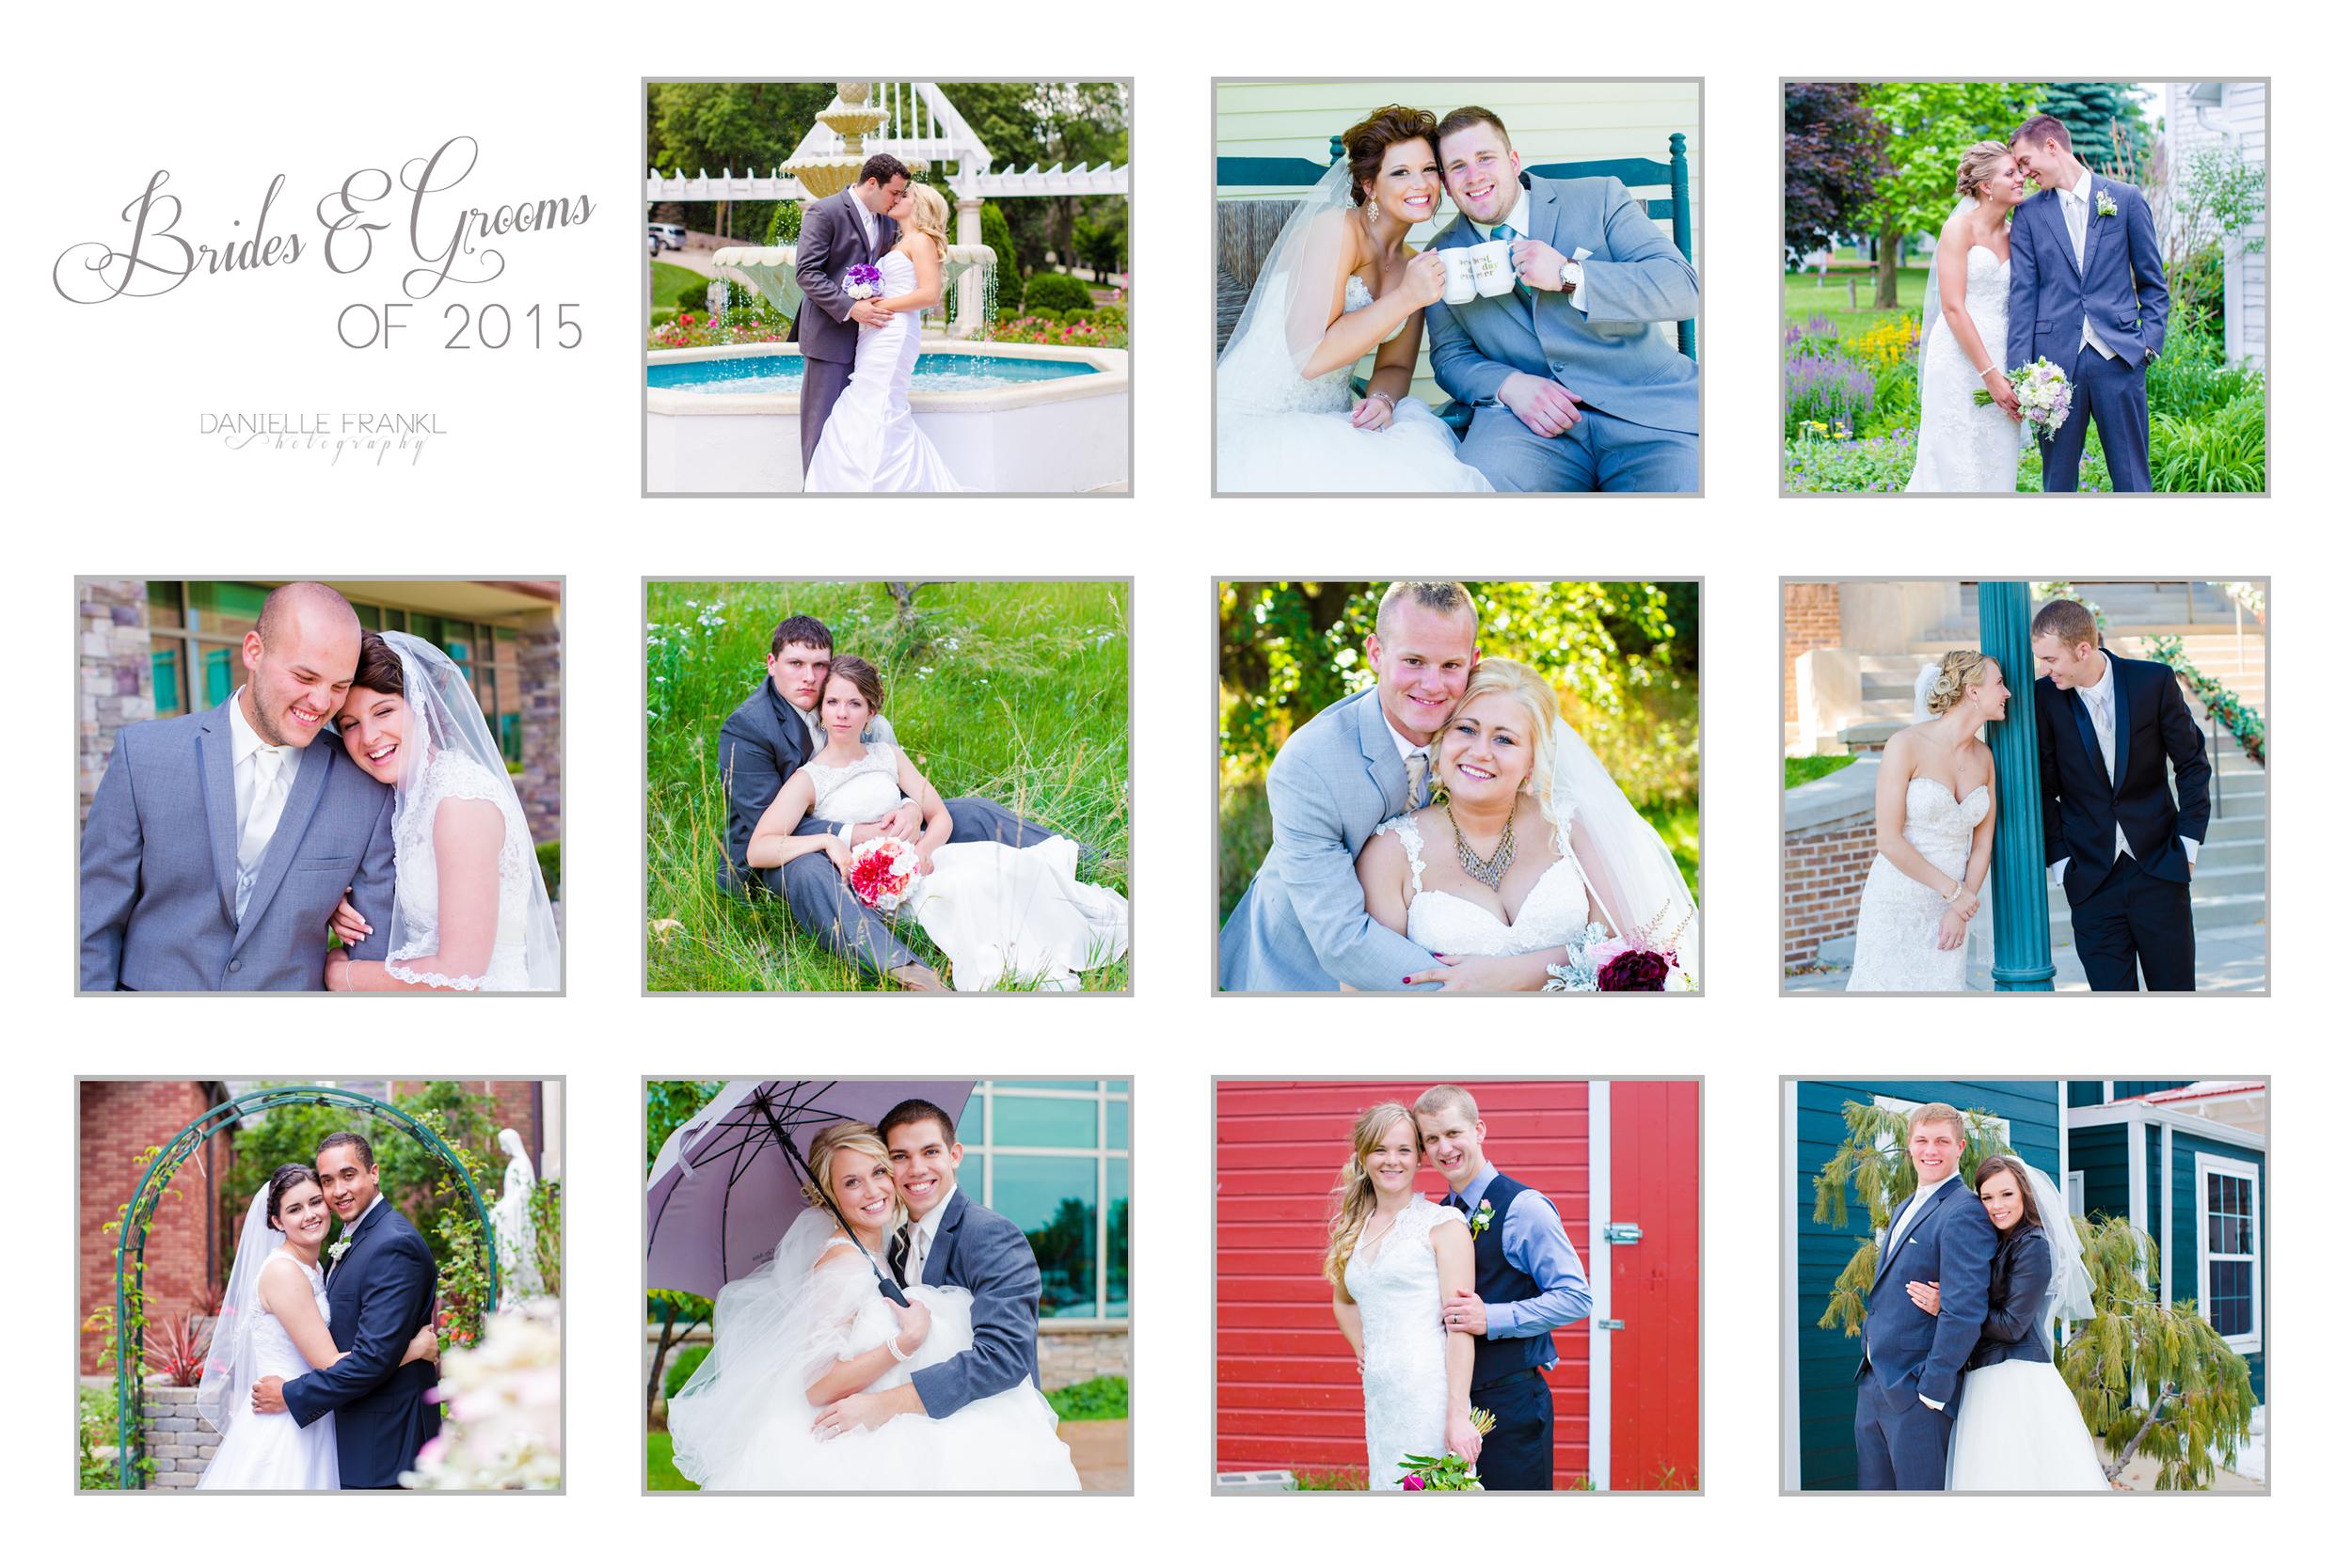 bride&grooms2015